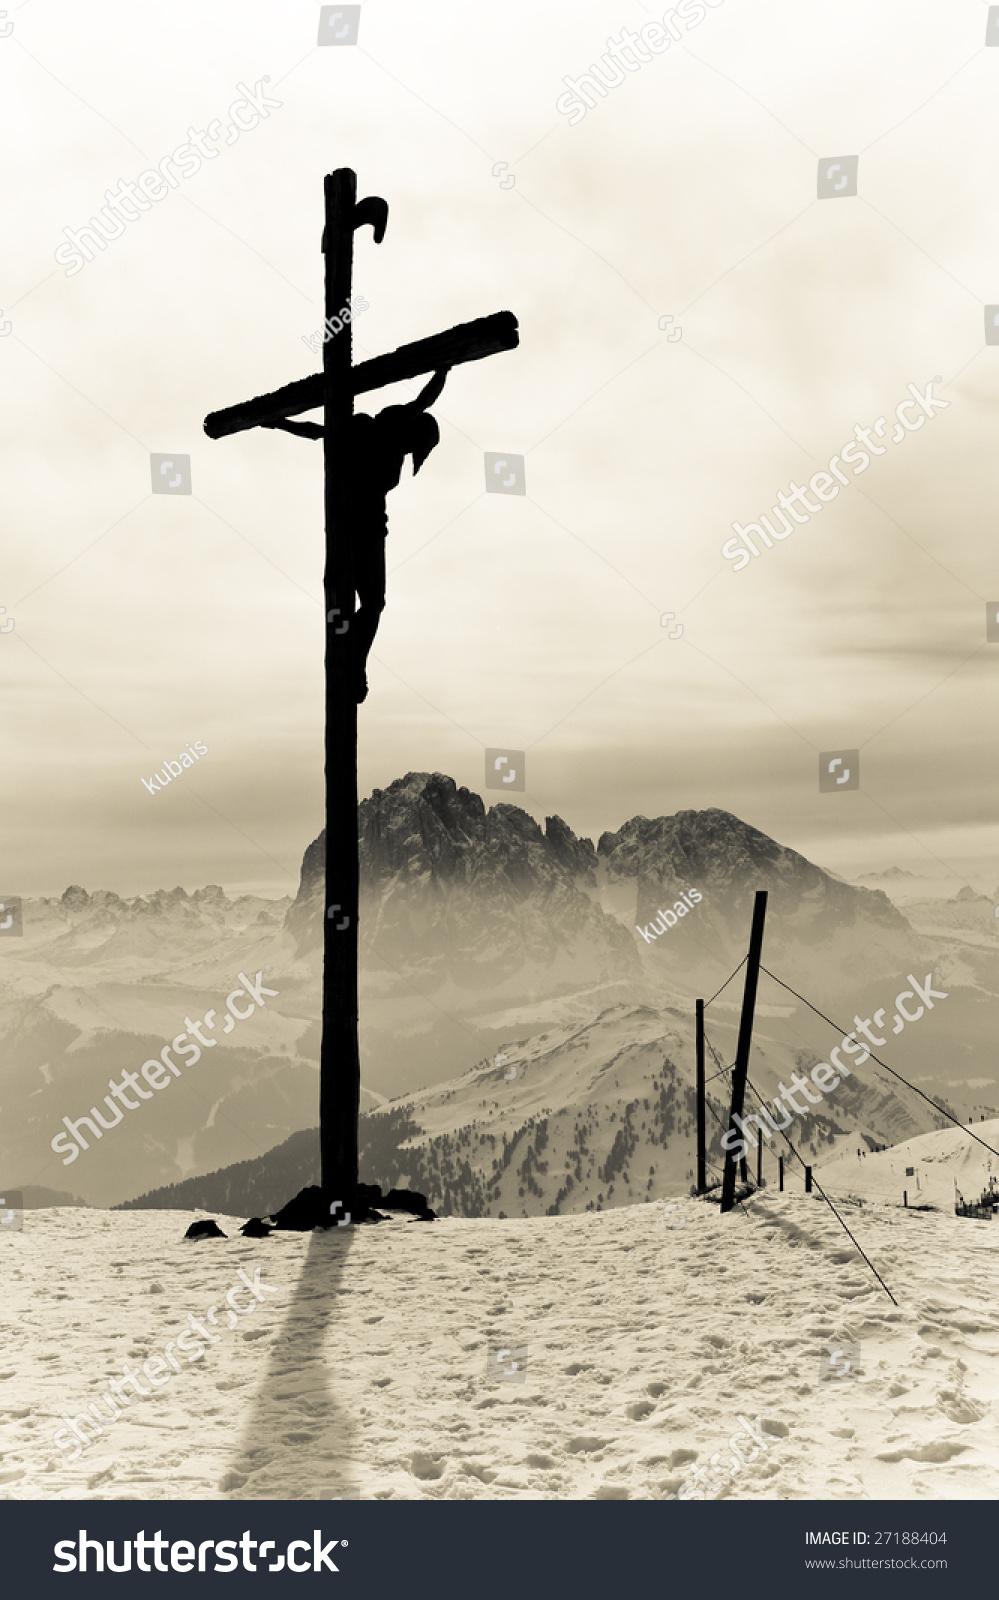 holy cross crucified jesus christ stock photo 27188404 shutterstock